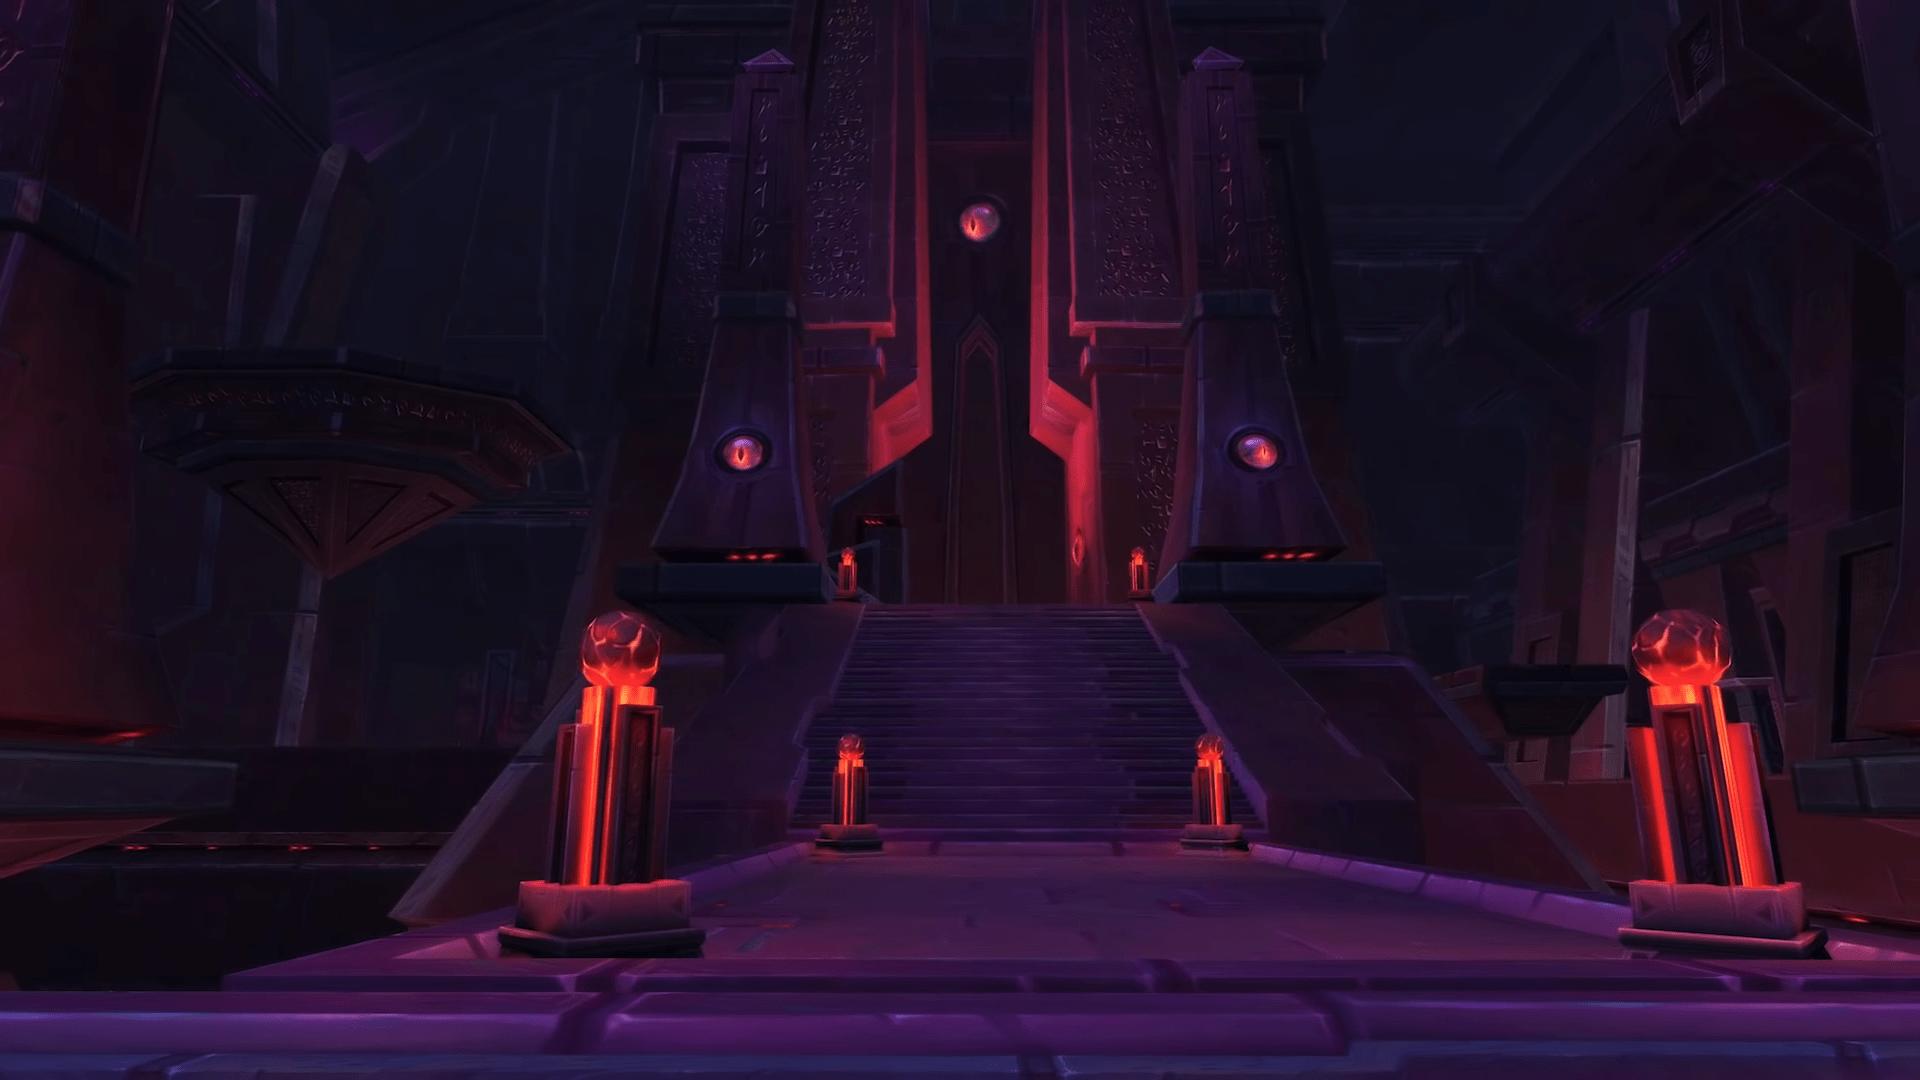 World Of Warcraft Patch 8.3 Public Test Realm Details Regarding New Corruption System